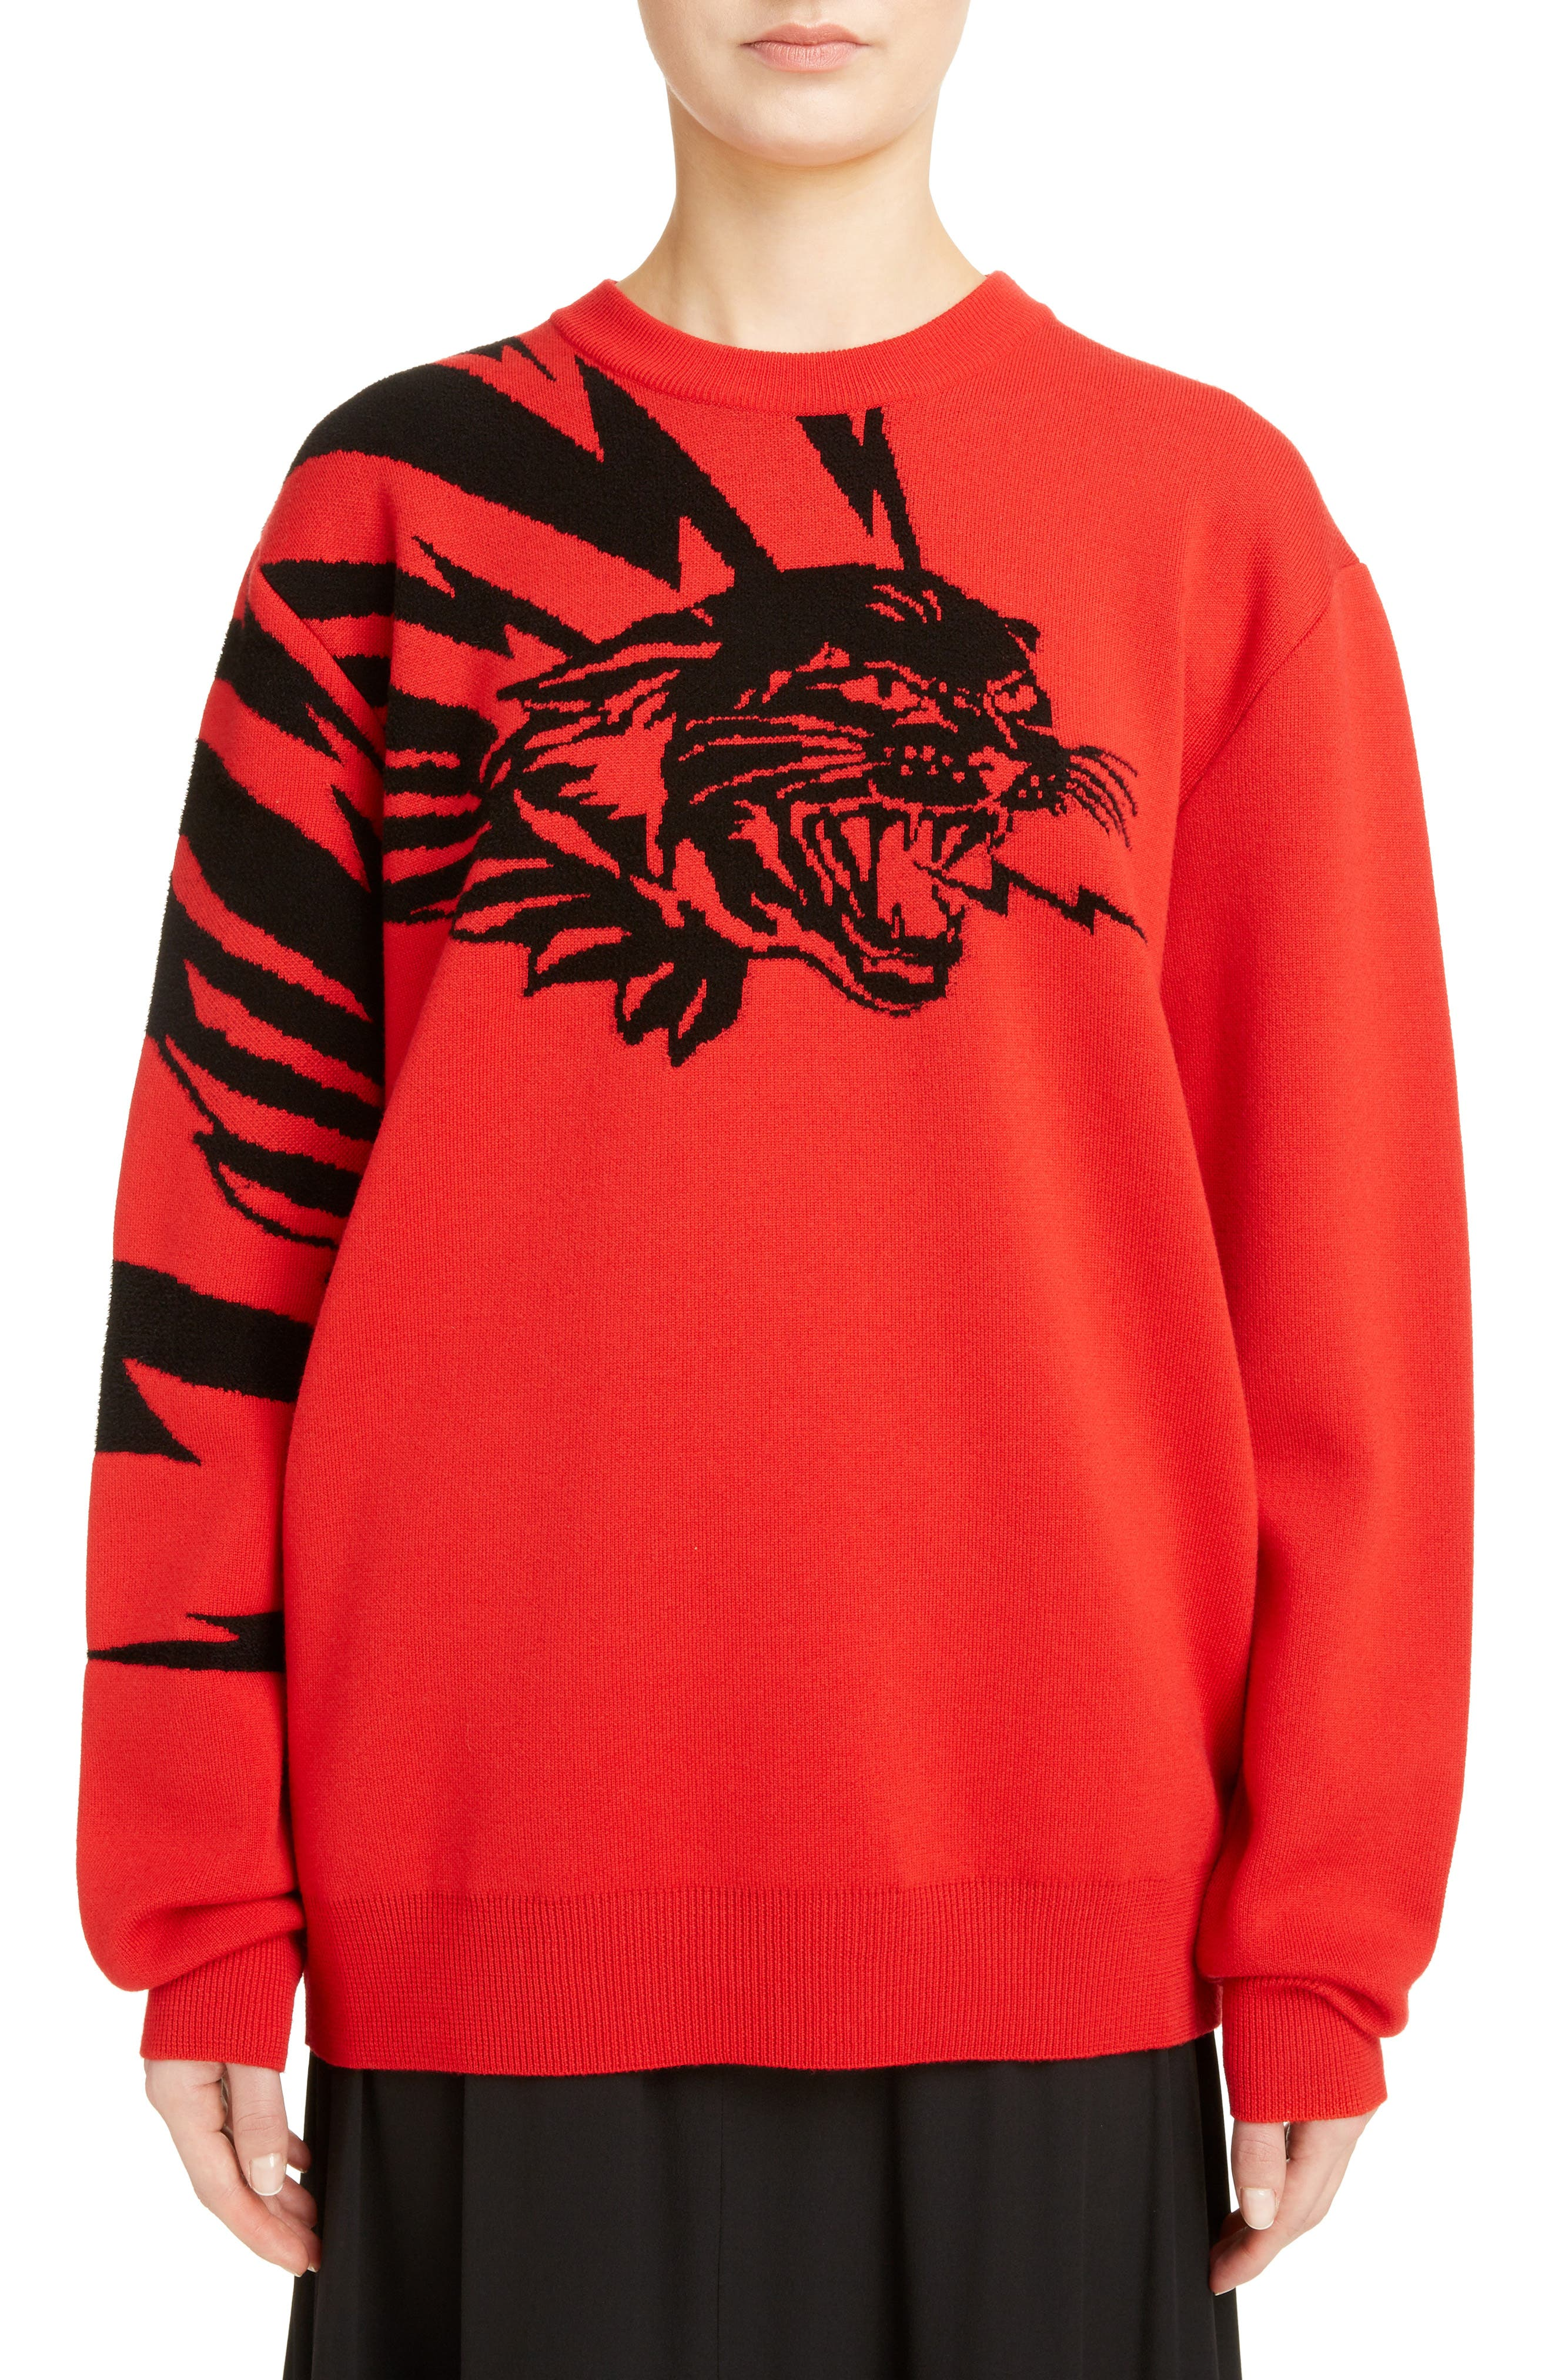 Tiger Wool Jacquard Sweater,                             Main thumbnail 1, color,                             RED/ BLACK